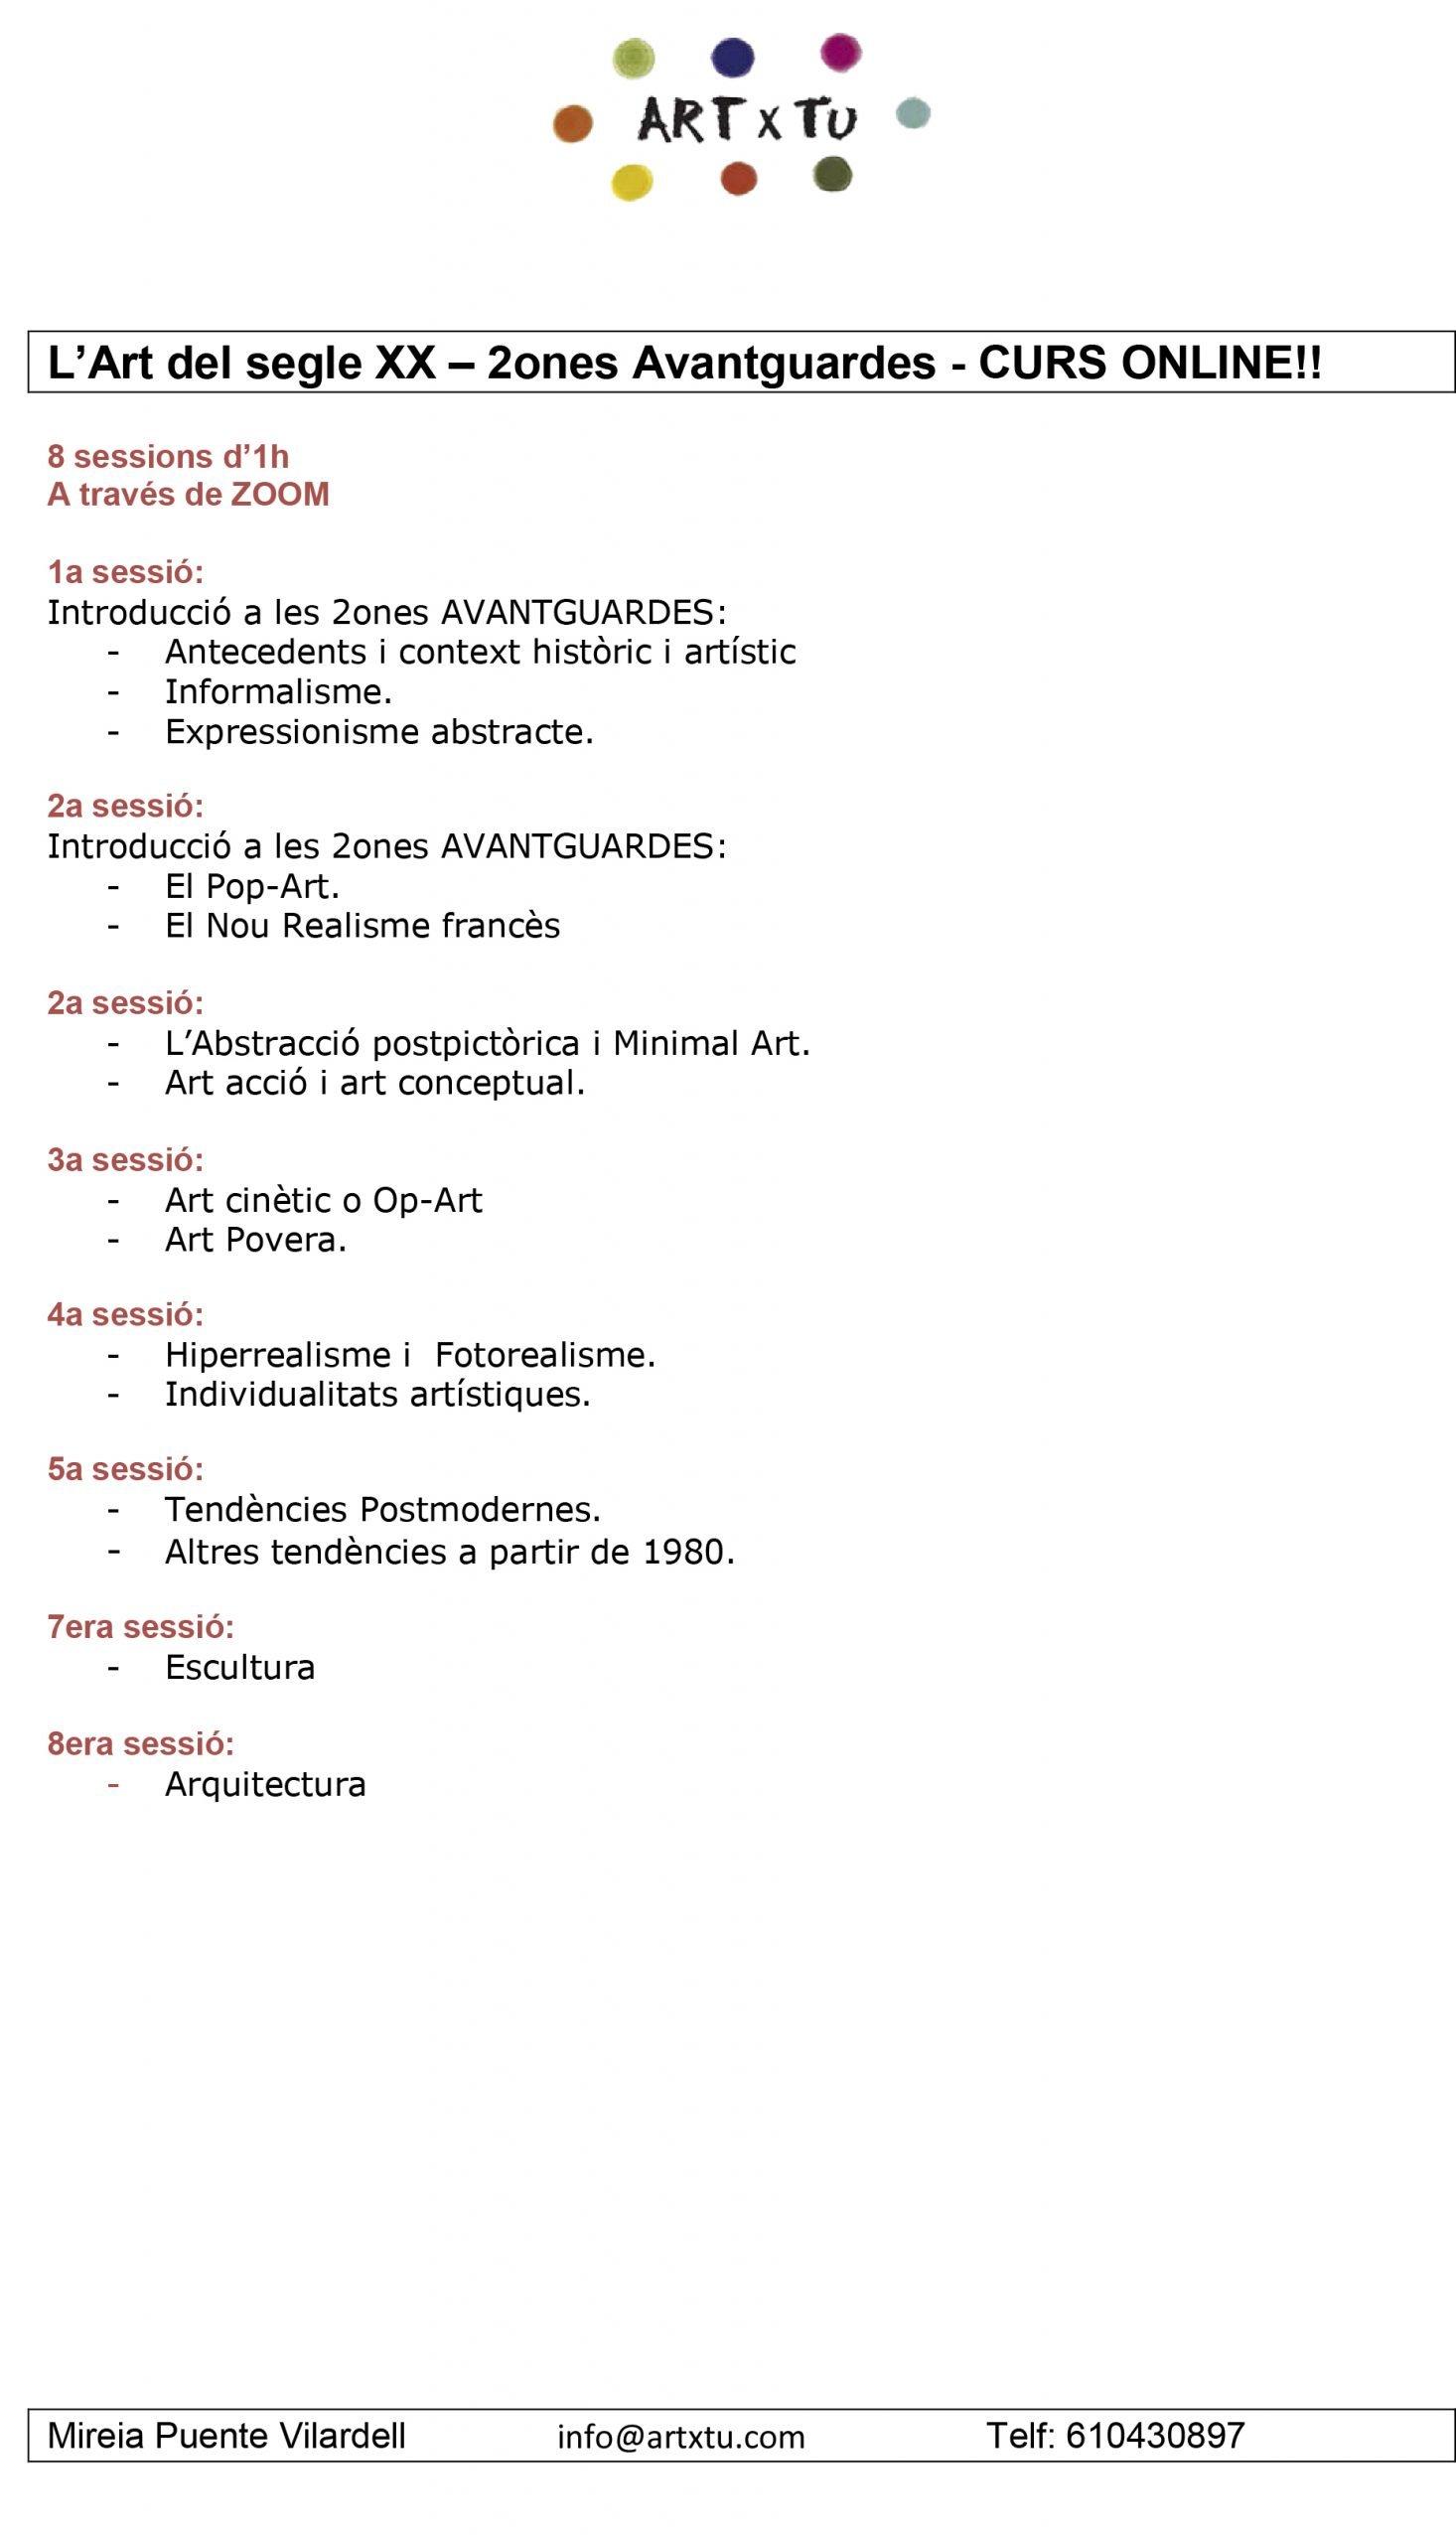 Programa-Art-del-segle-XX-2ones-Avantguardes-scaled Prueba calendario